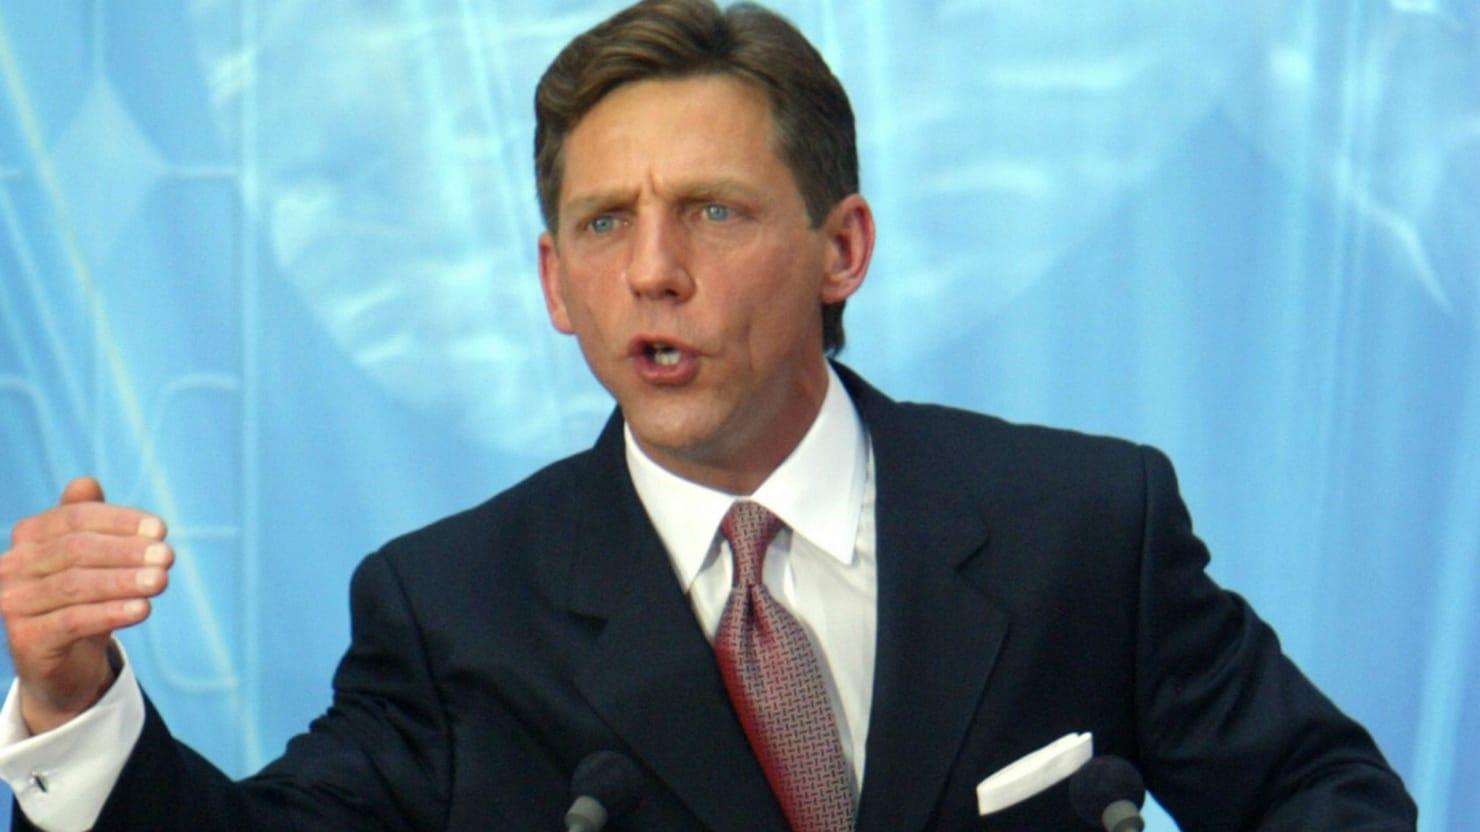 Ex-Scientologists: David Miscavige Is a 'Terrorist'